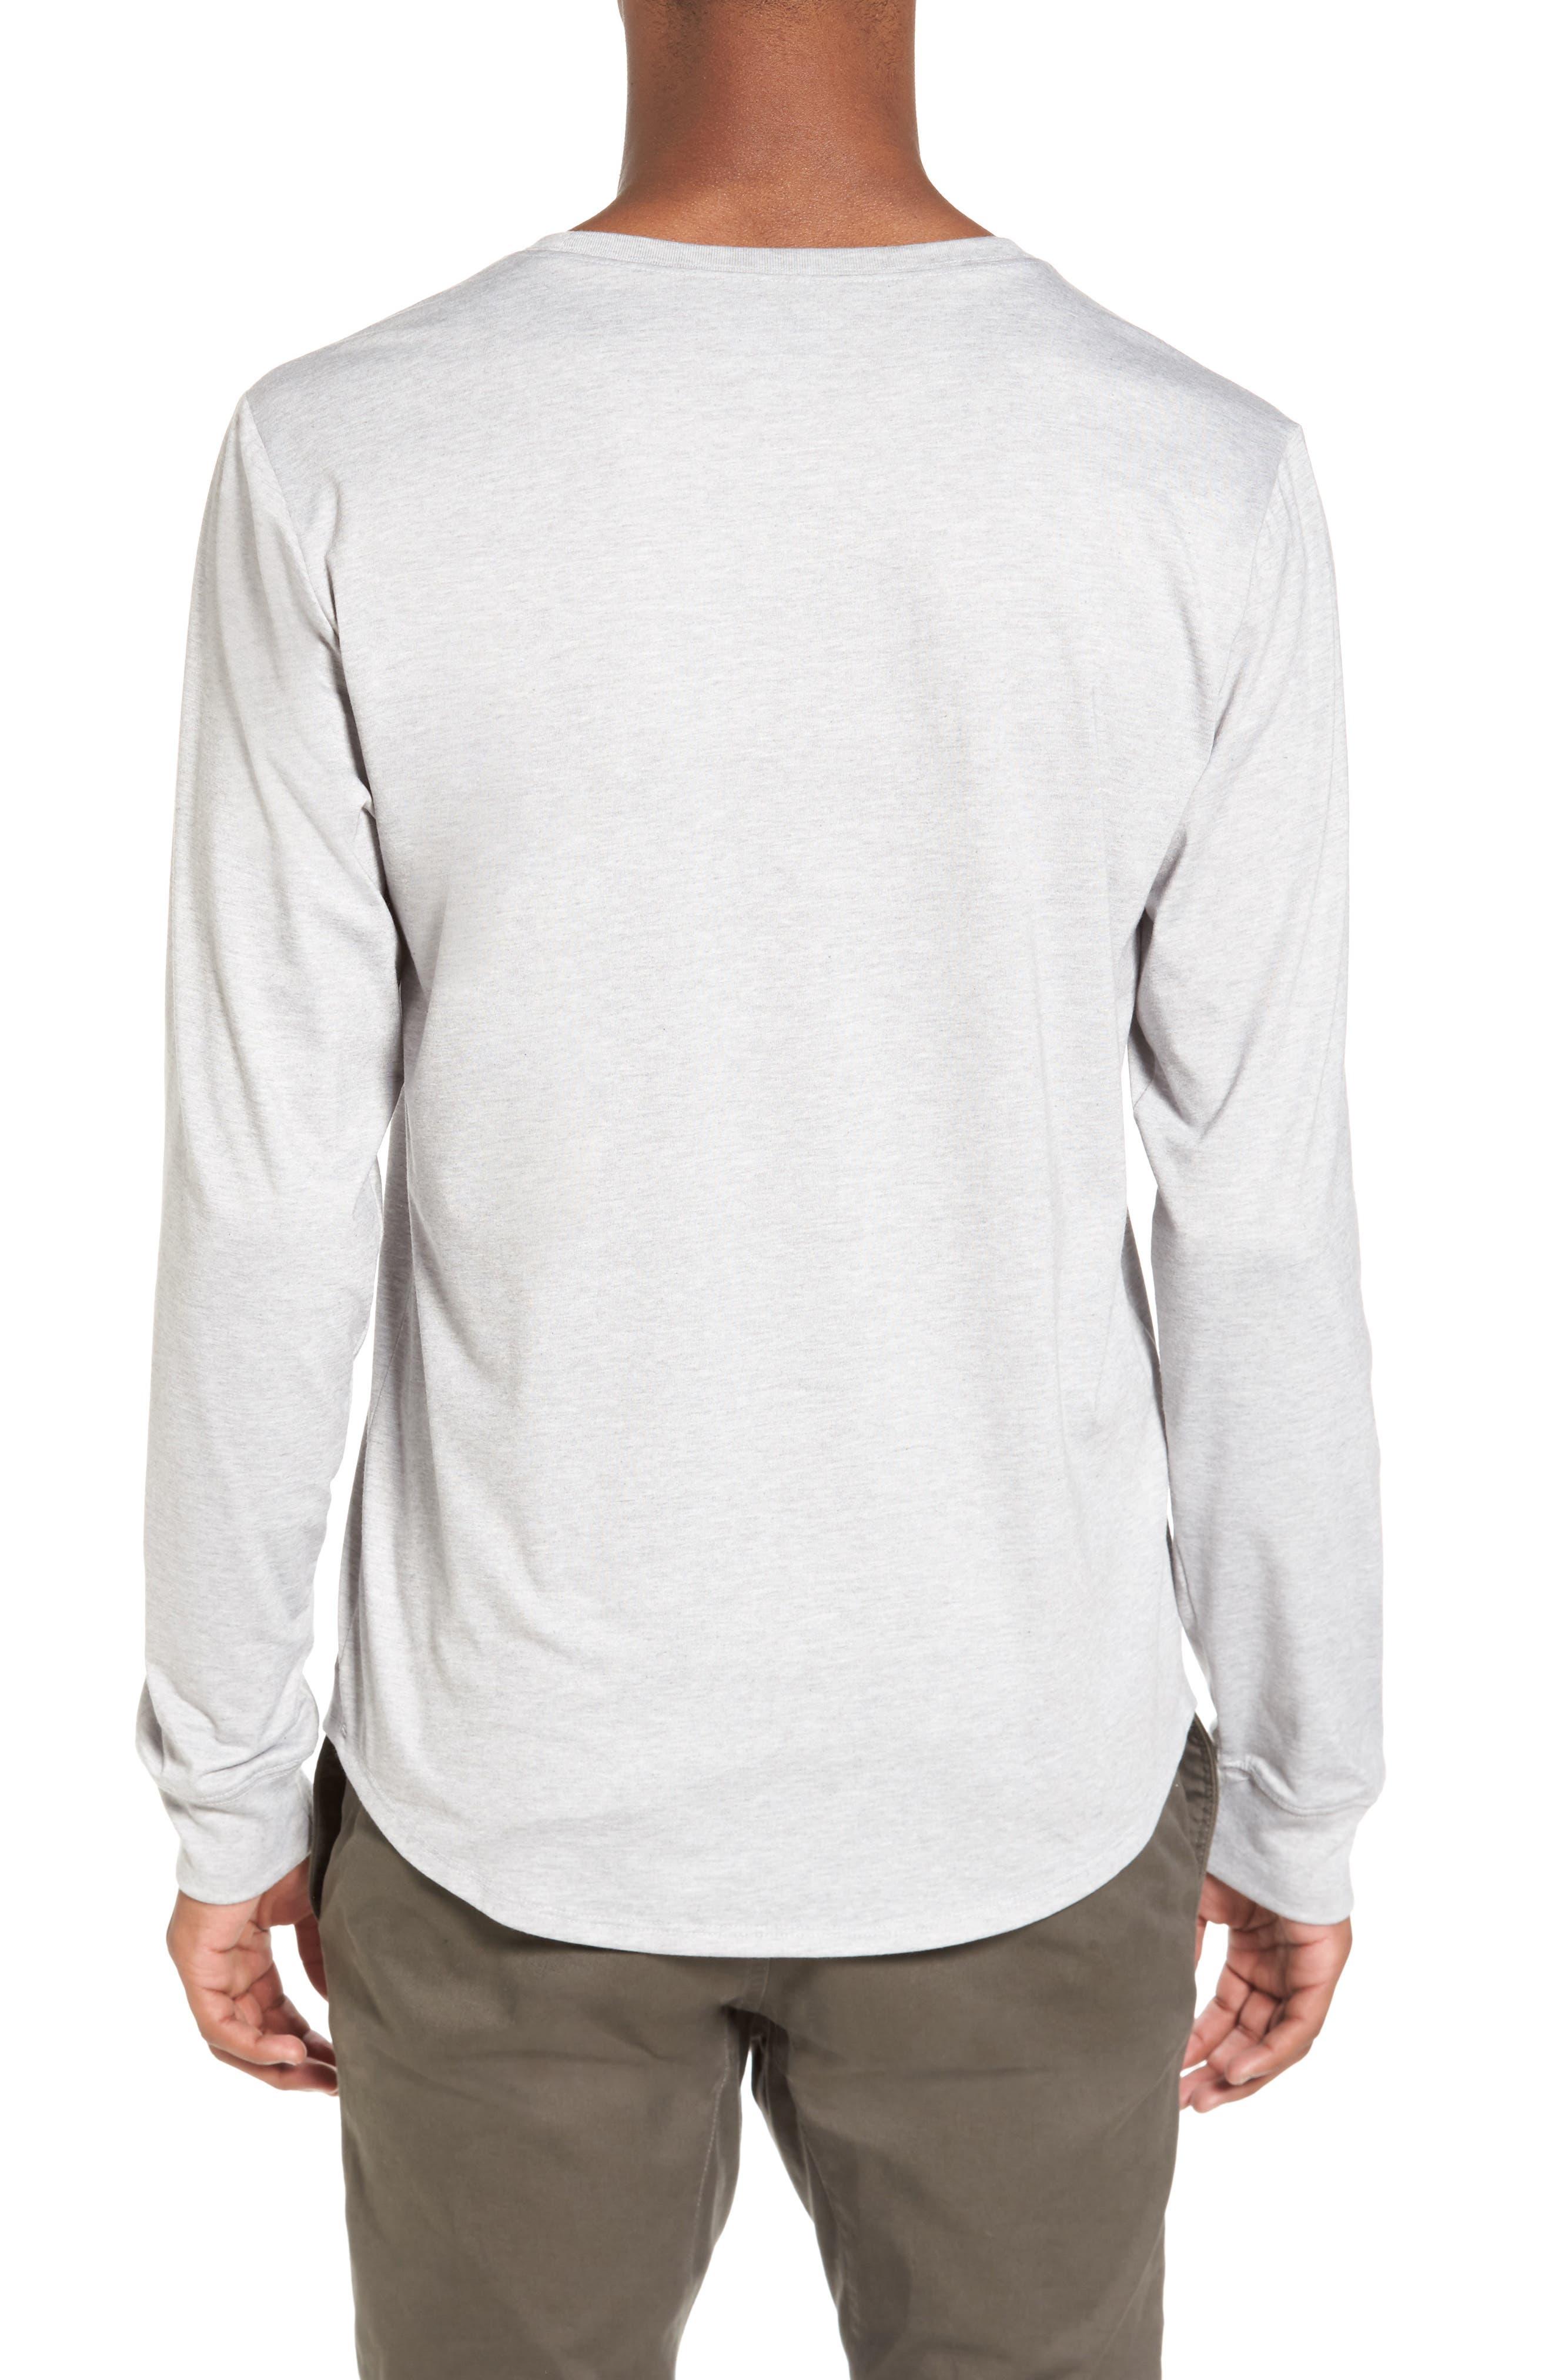 Yantra Long Sleeve T-Shirt,                             Alternate thumbnail 2, color,                             Heather Grey/ Heather Grey